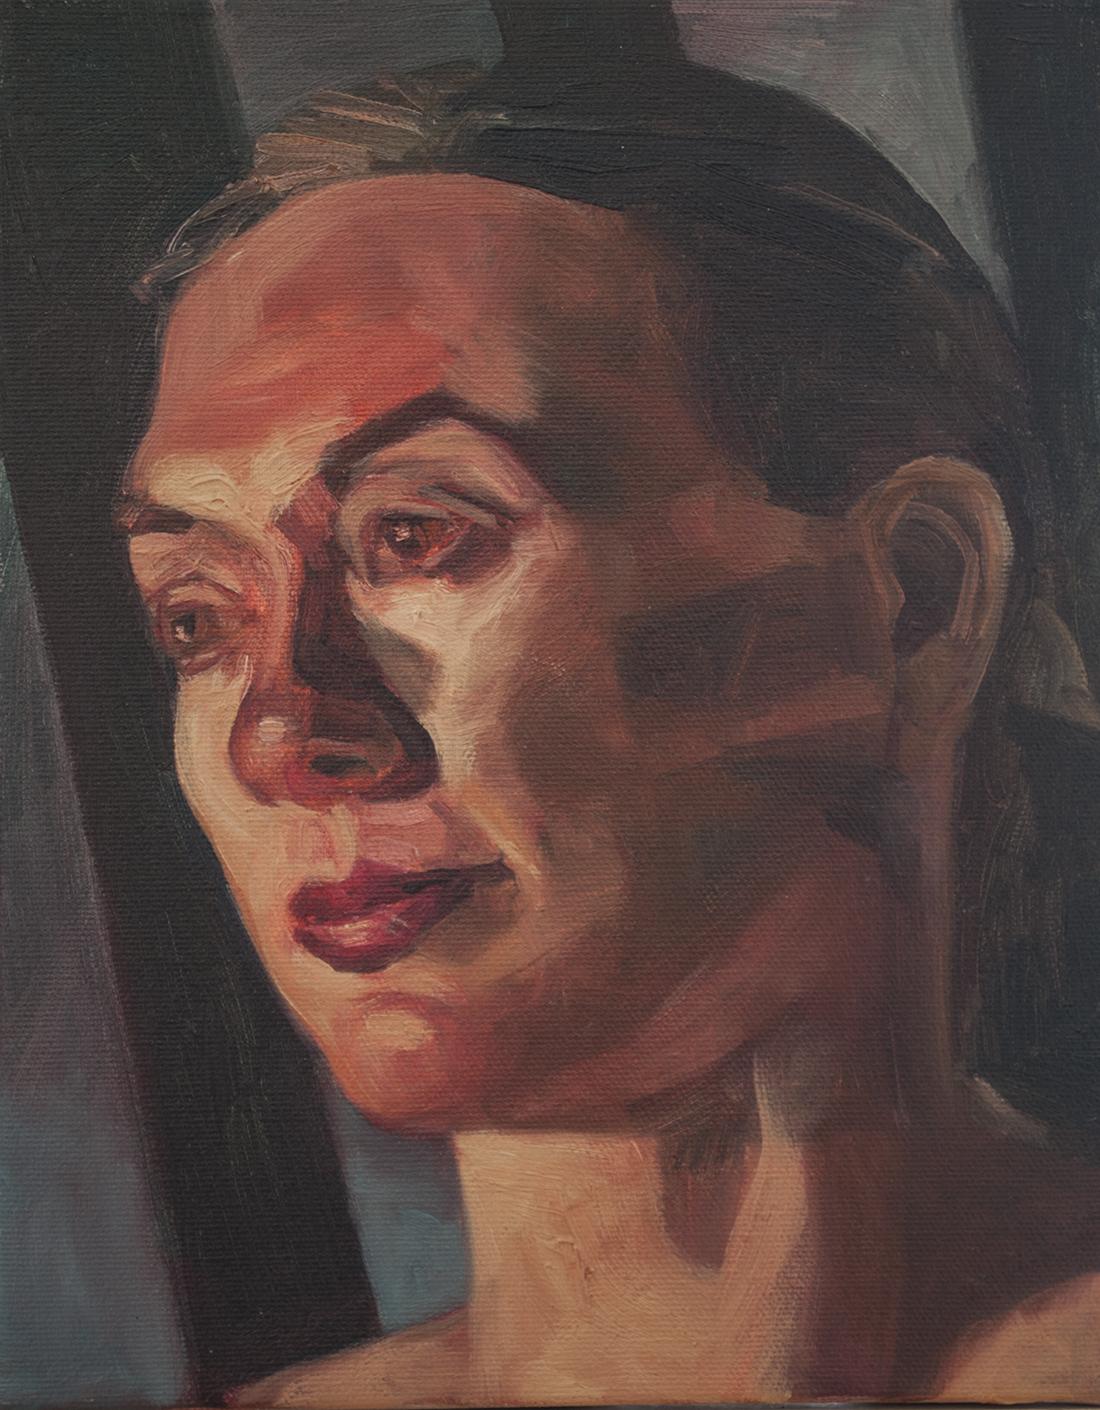 A woman's head